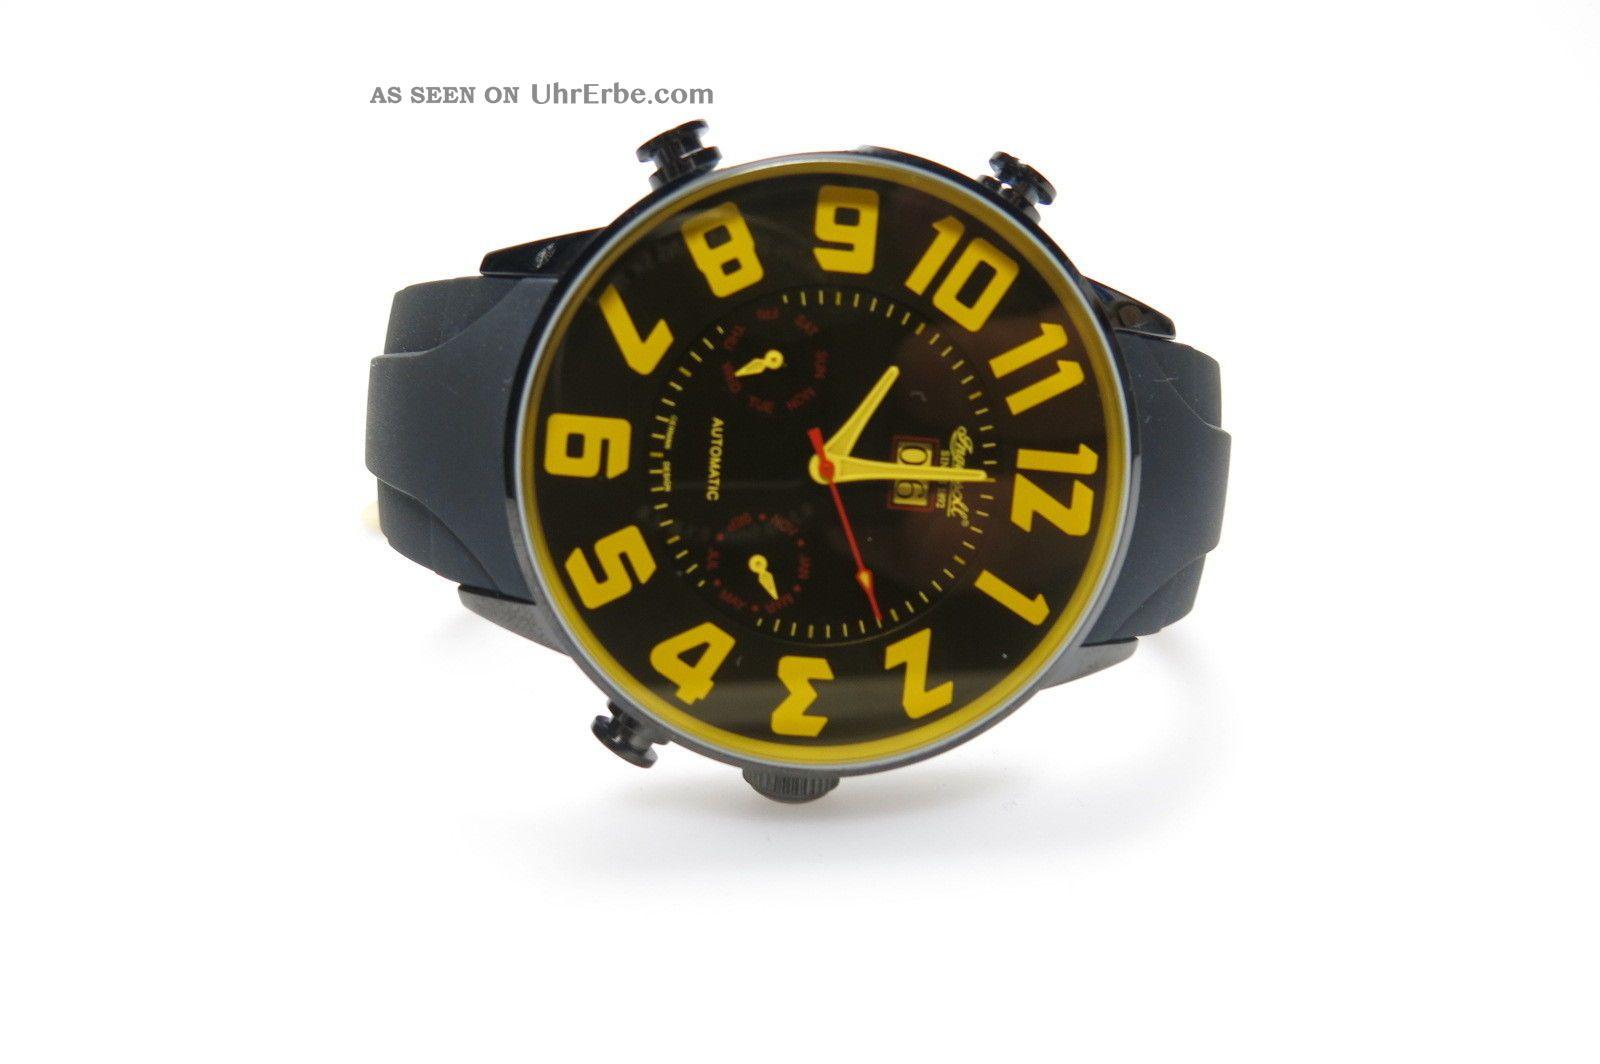 Ingersoll Yellowstone In2811bkyi Herrenuhr Schwarzes Kautschuckband Automatic Armbanduhren Bild